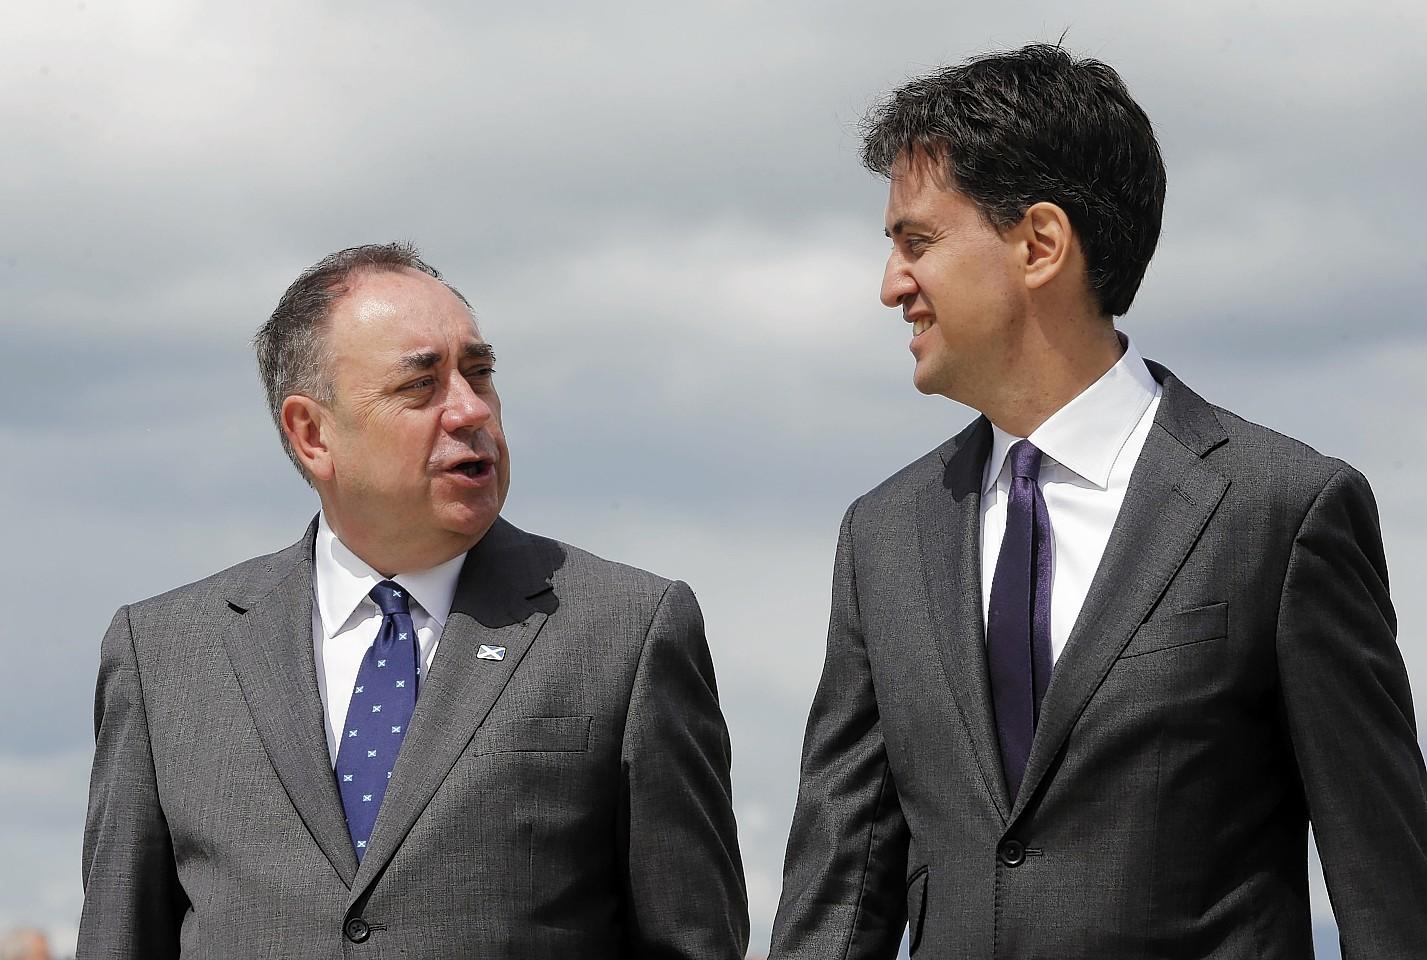 David Cameron says Ed Miliband wants to crawl to power in Alex Salmond's pocket